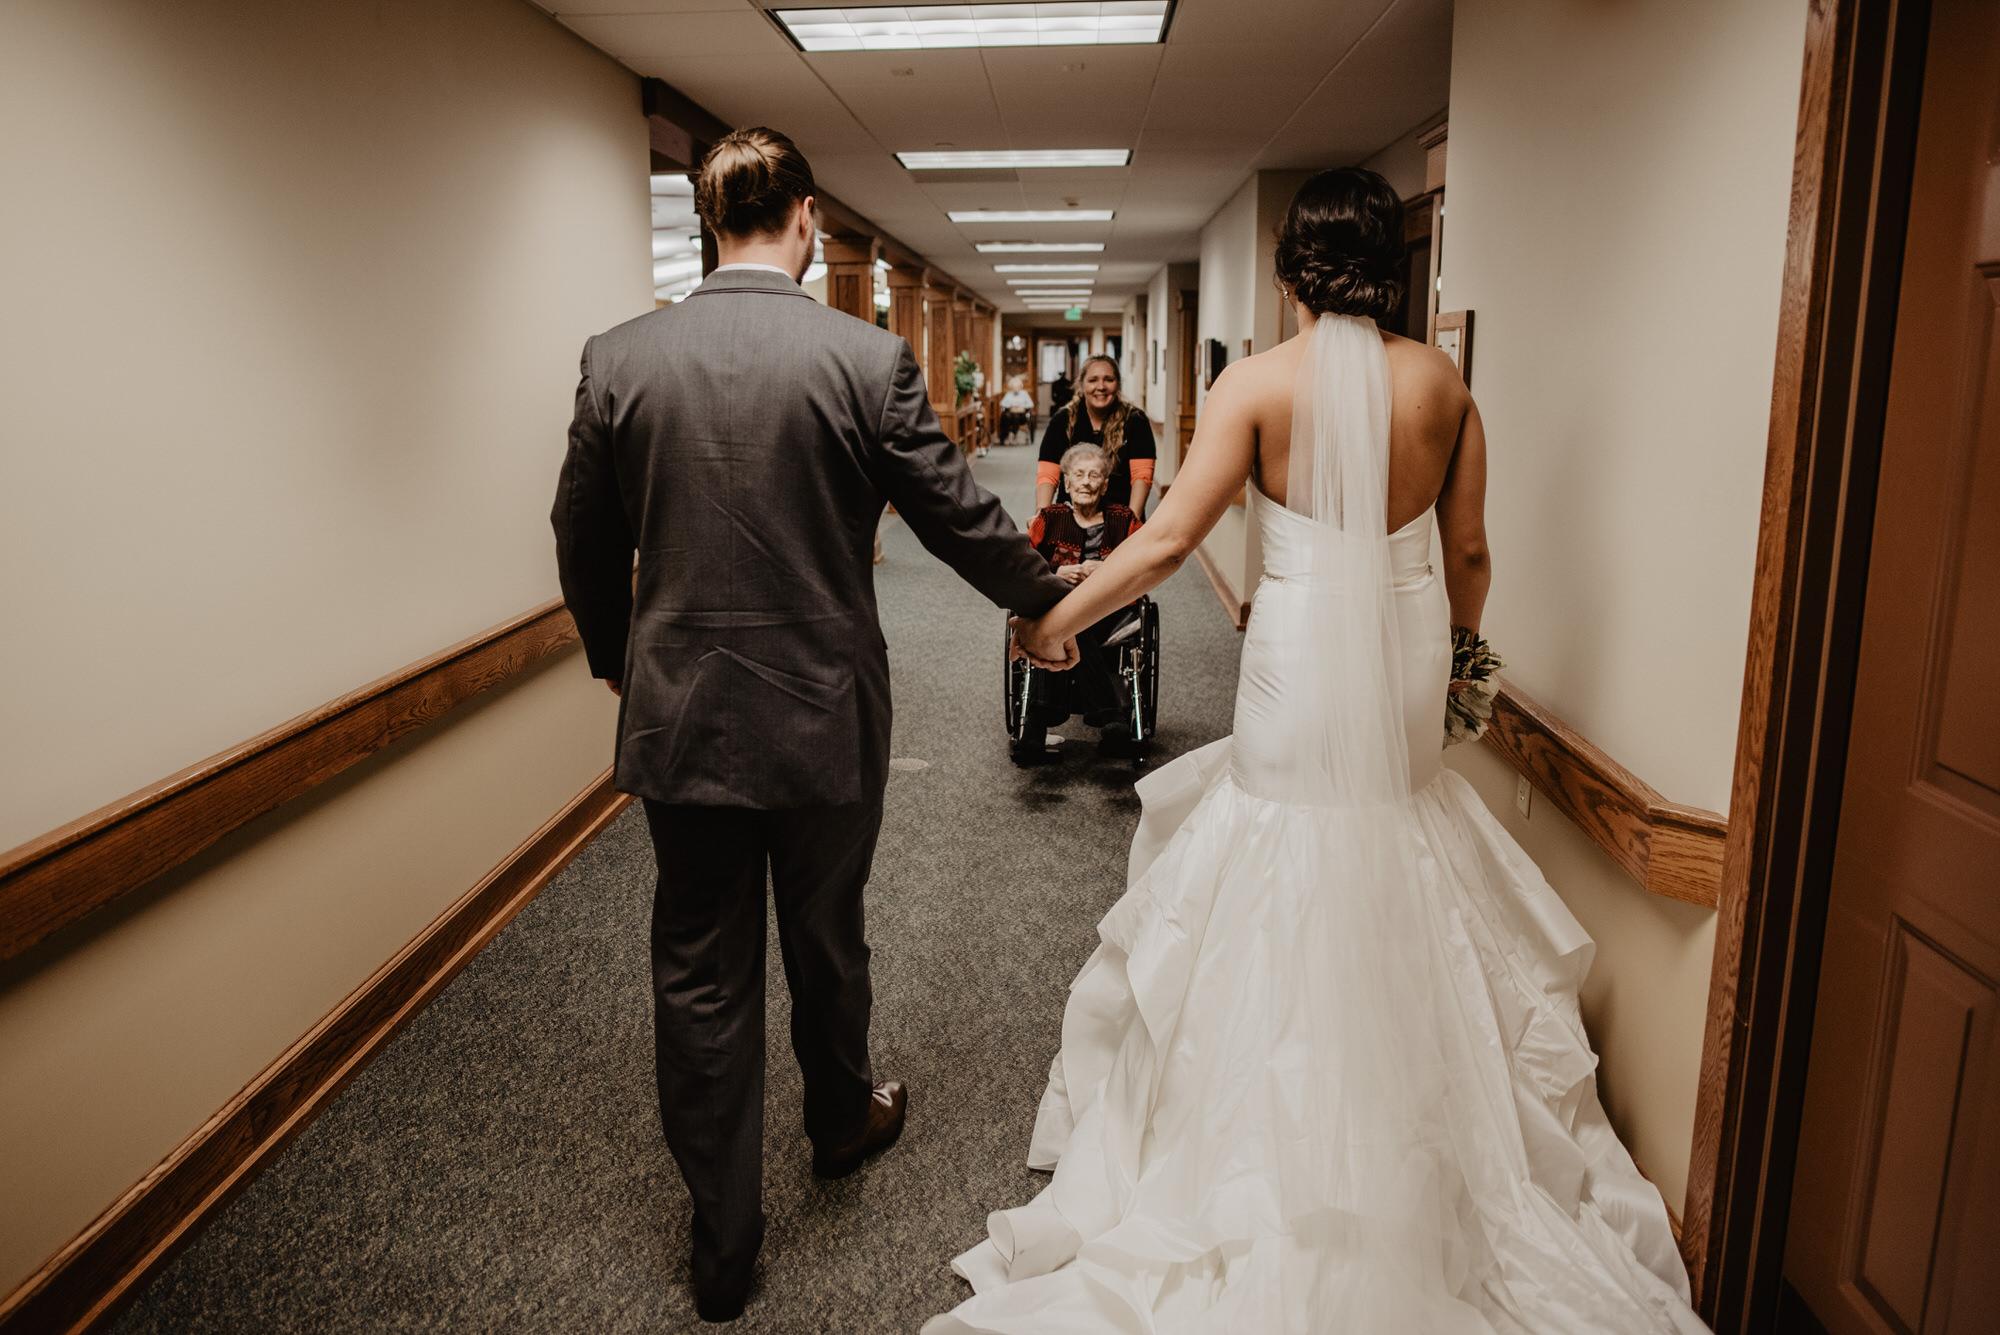 Kaylie_Sirek_Photography_Grand_Island_Kearney_Hastings_Lincoln_Nebraska_Wedding_Engagement_Grandma_Grandparent_Delray_Downtown_DowntownLincoln_LNK_Emotional_Bride_Groom_Photographer_32.jpg